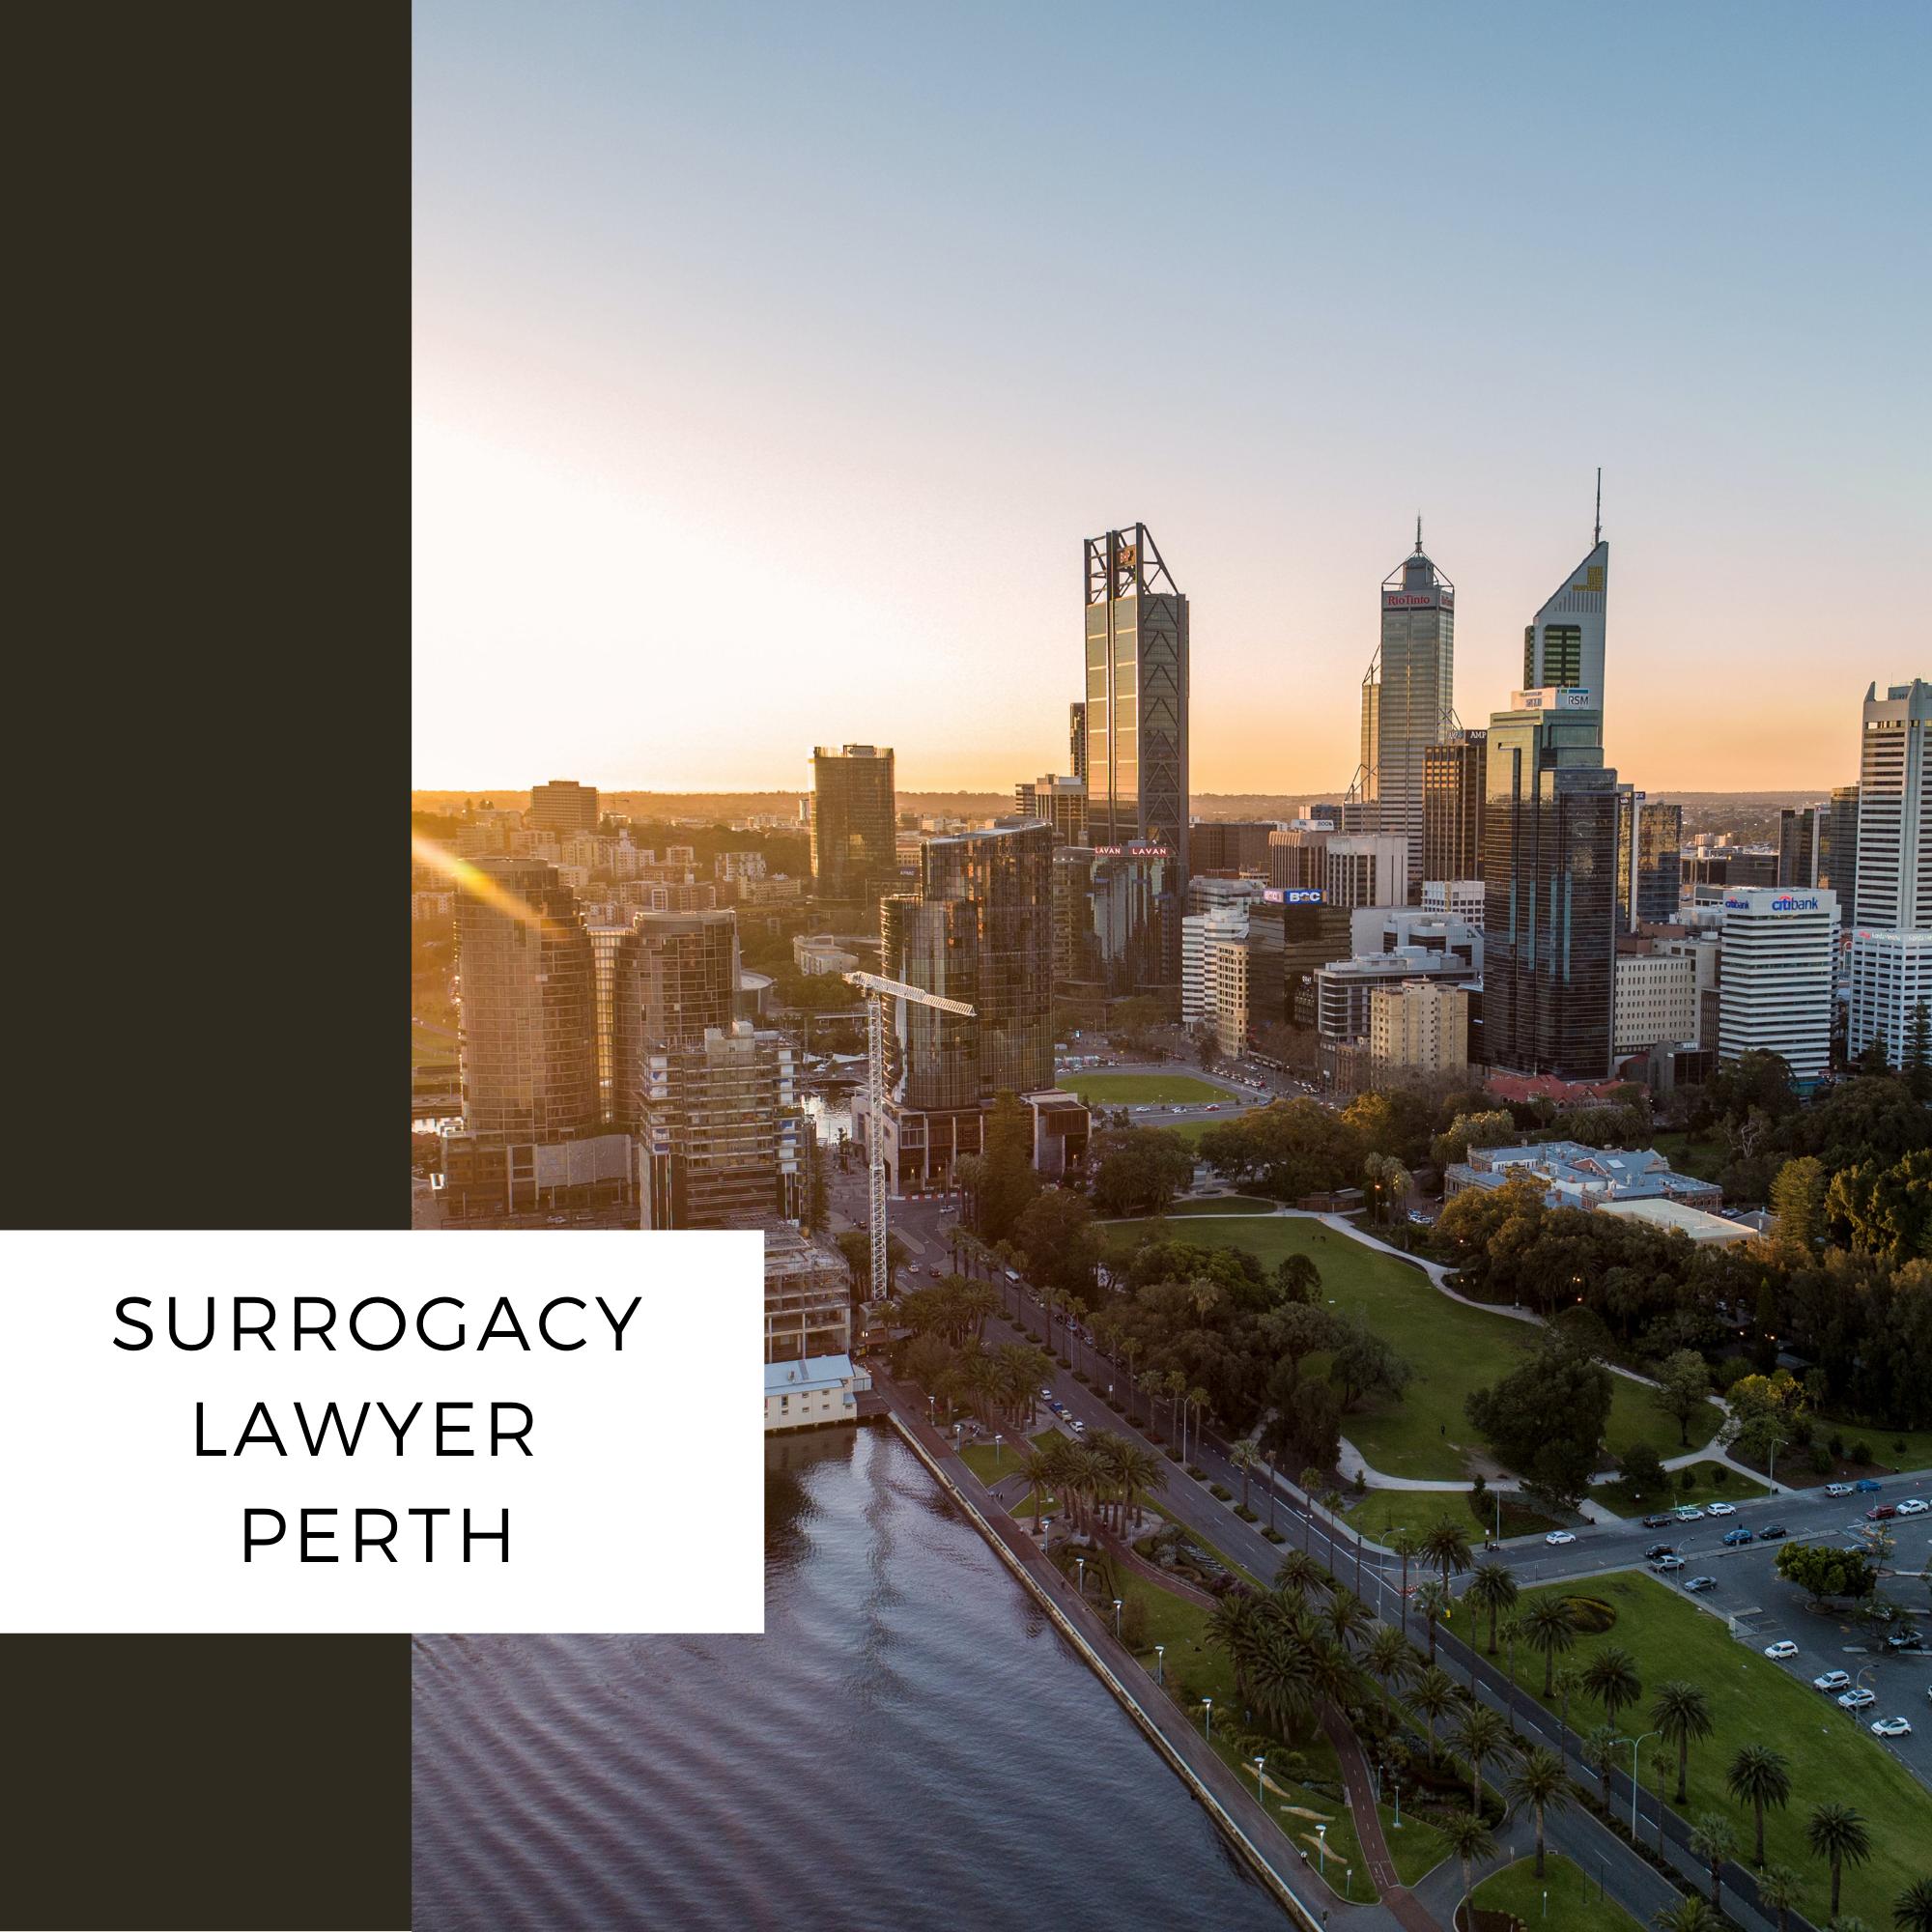 surrogacy lawyer perth